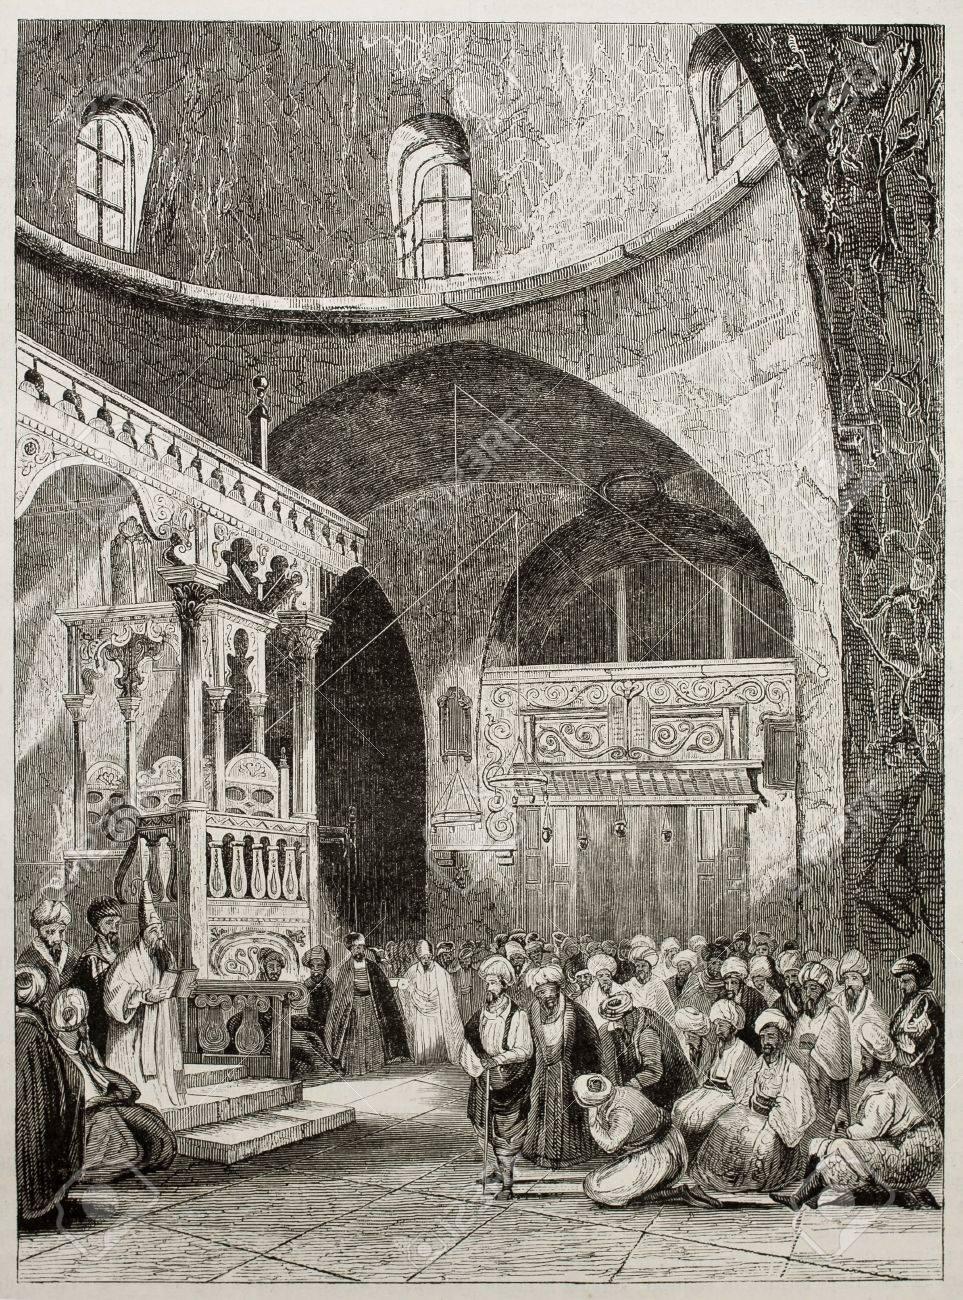 Sinagogue Interior Old Illustration, Jerusalem. By Unidentified ...